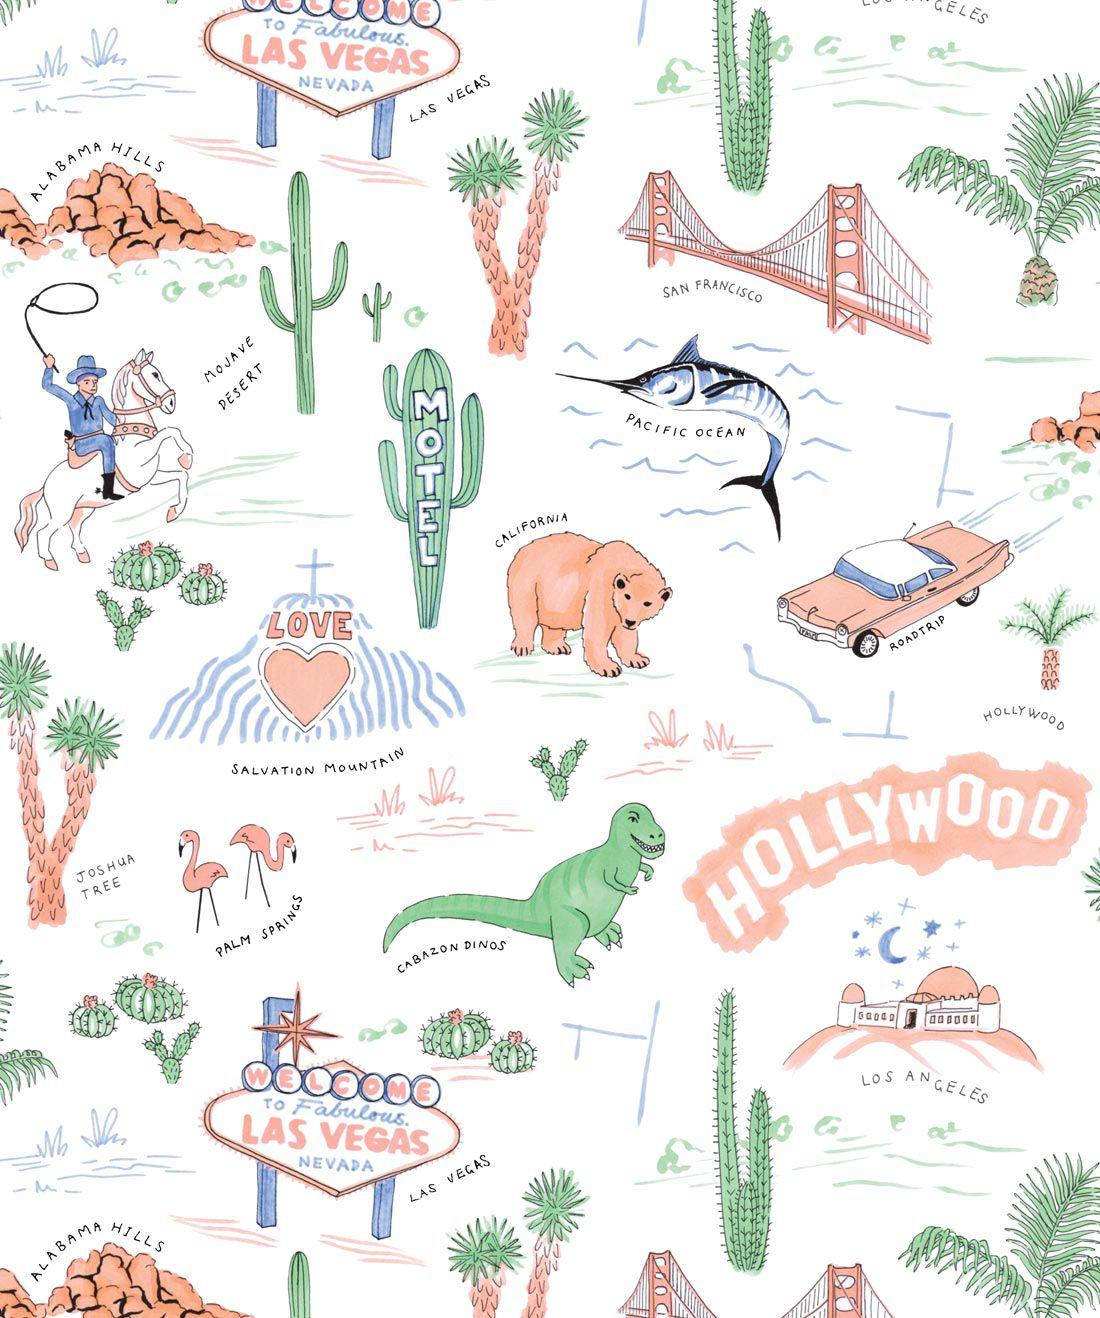 The Road Trip Wallpaper